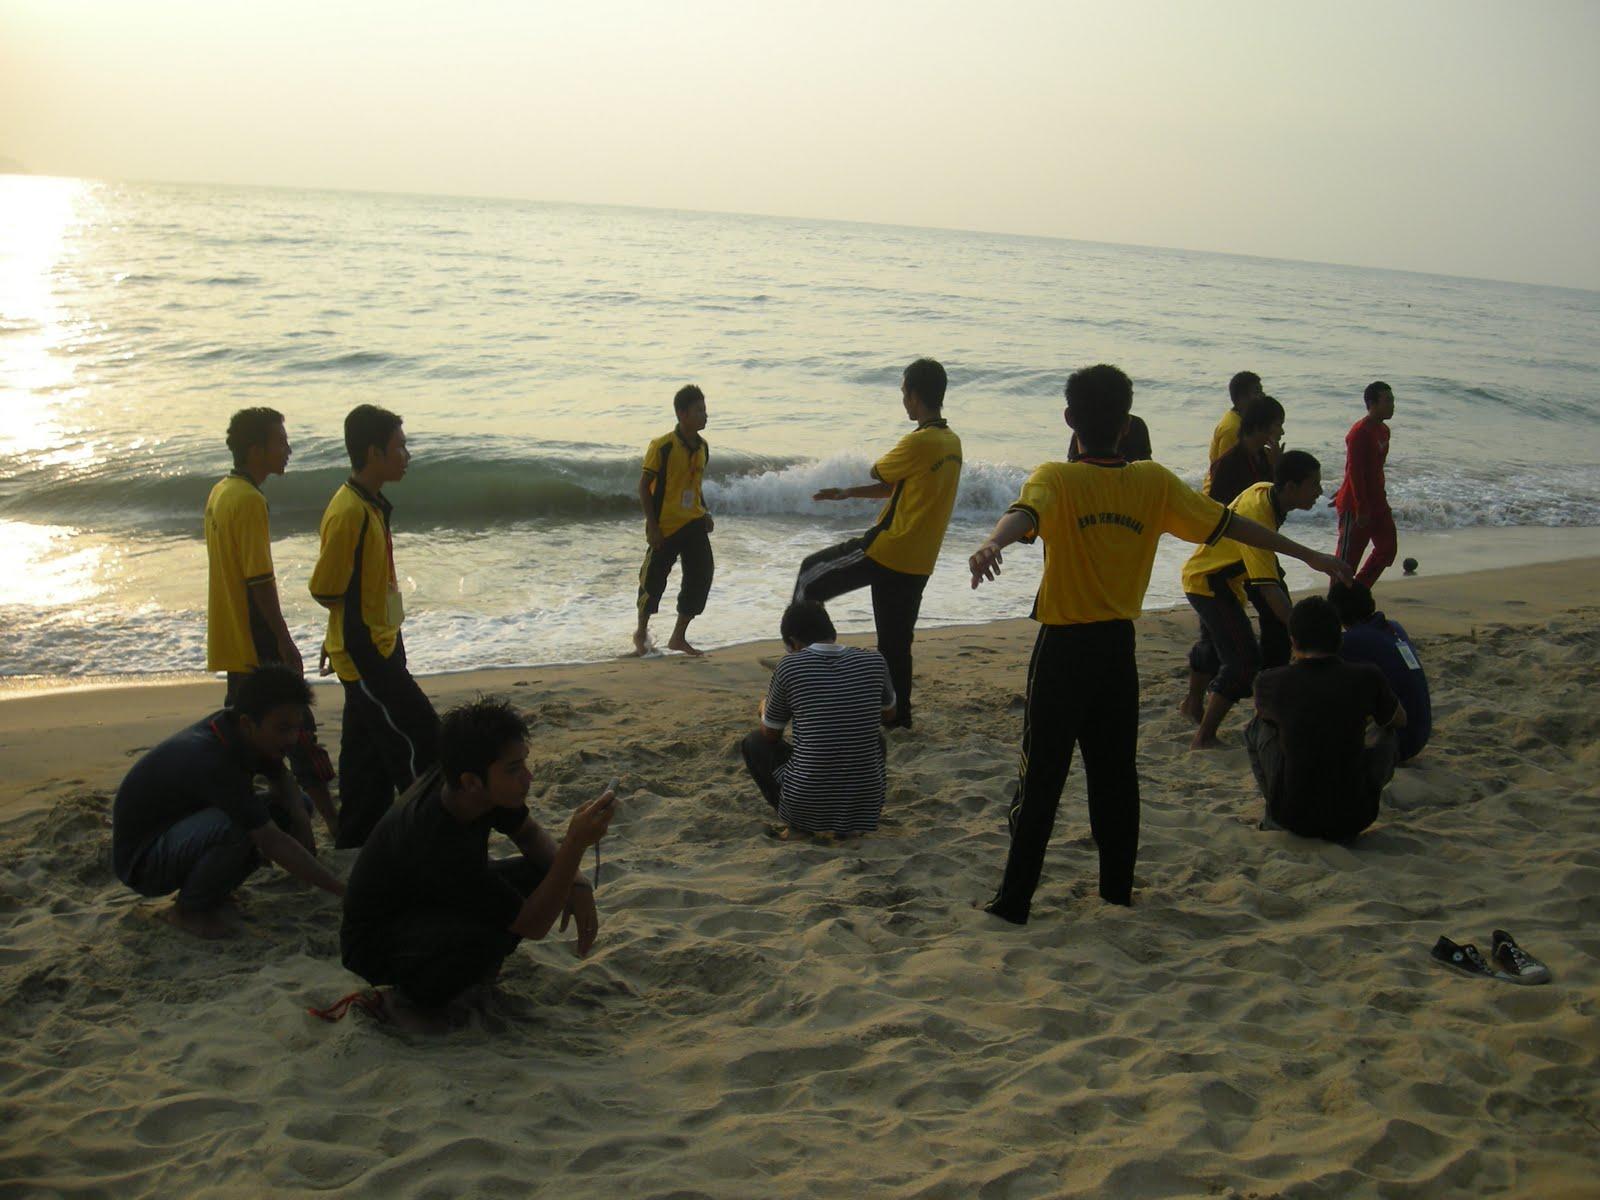 peserta sedang bersenamrobik ditepi pantai